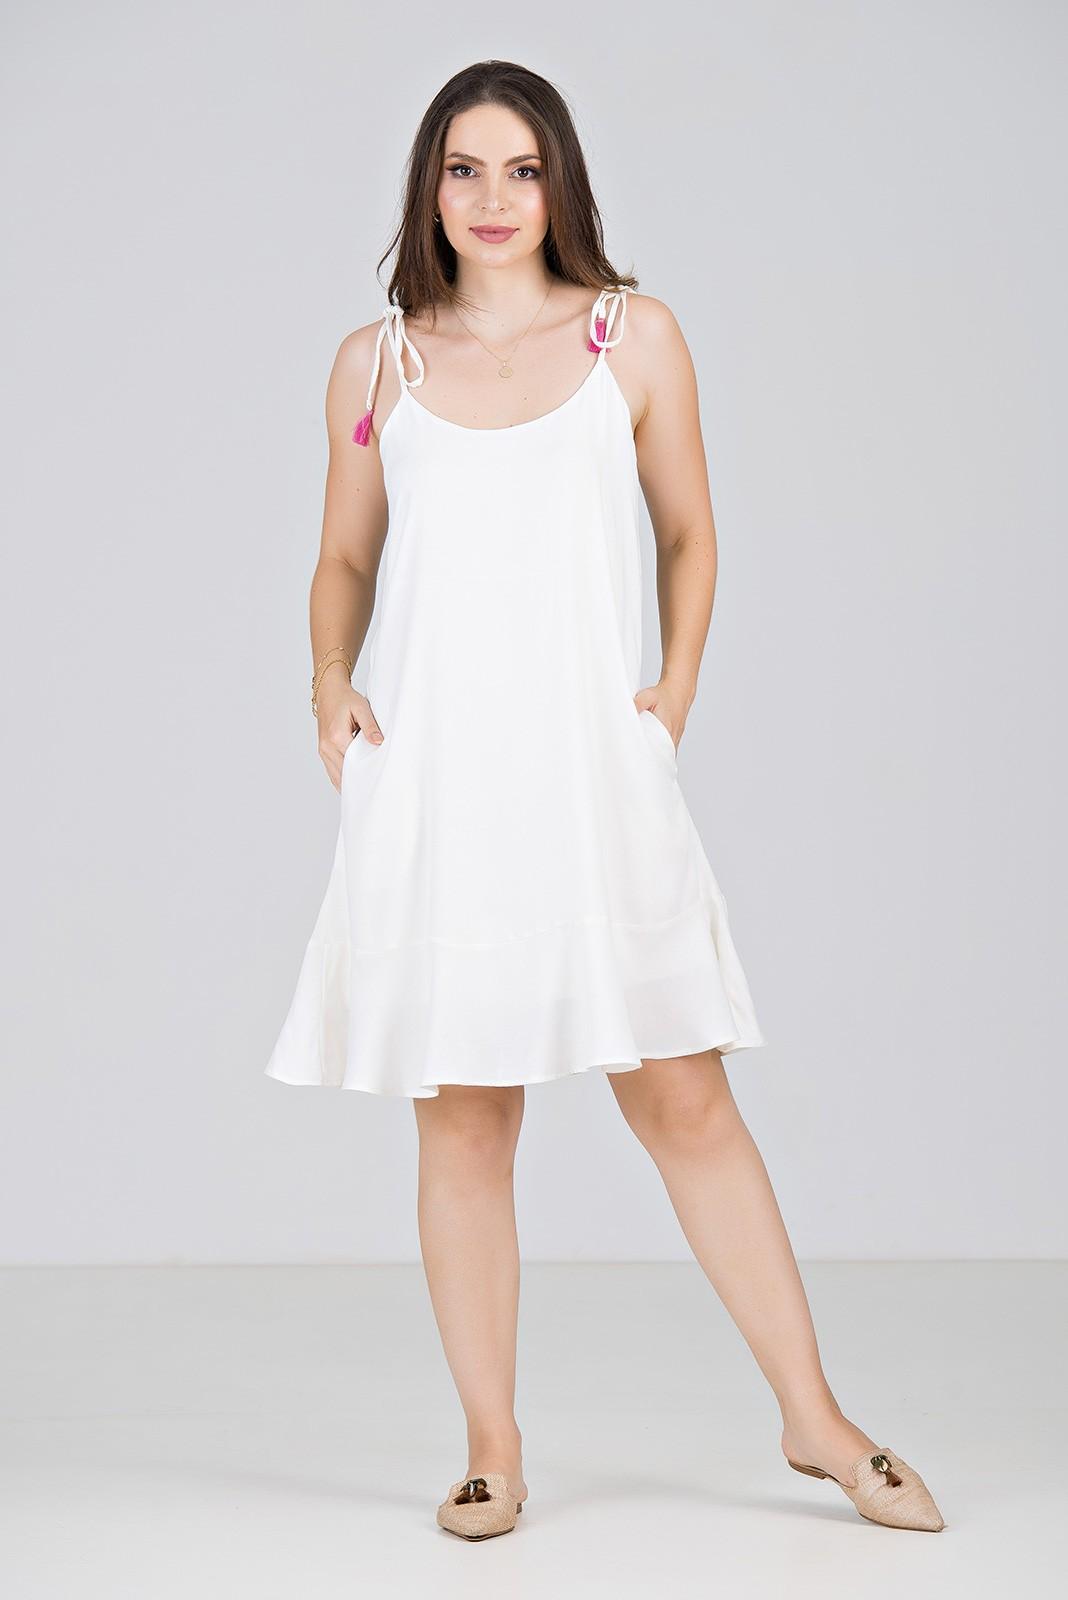 Vestido Curto em Viscose Off White - Midsize